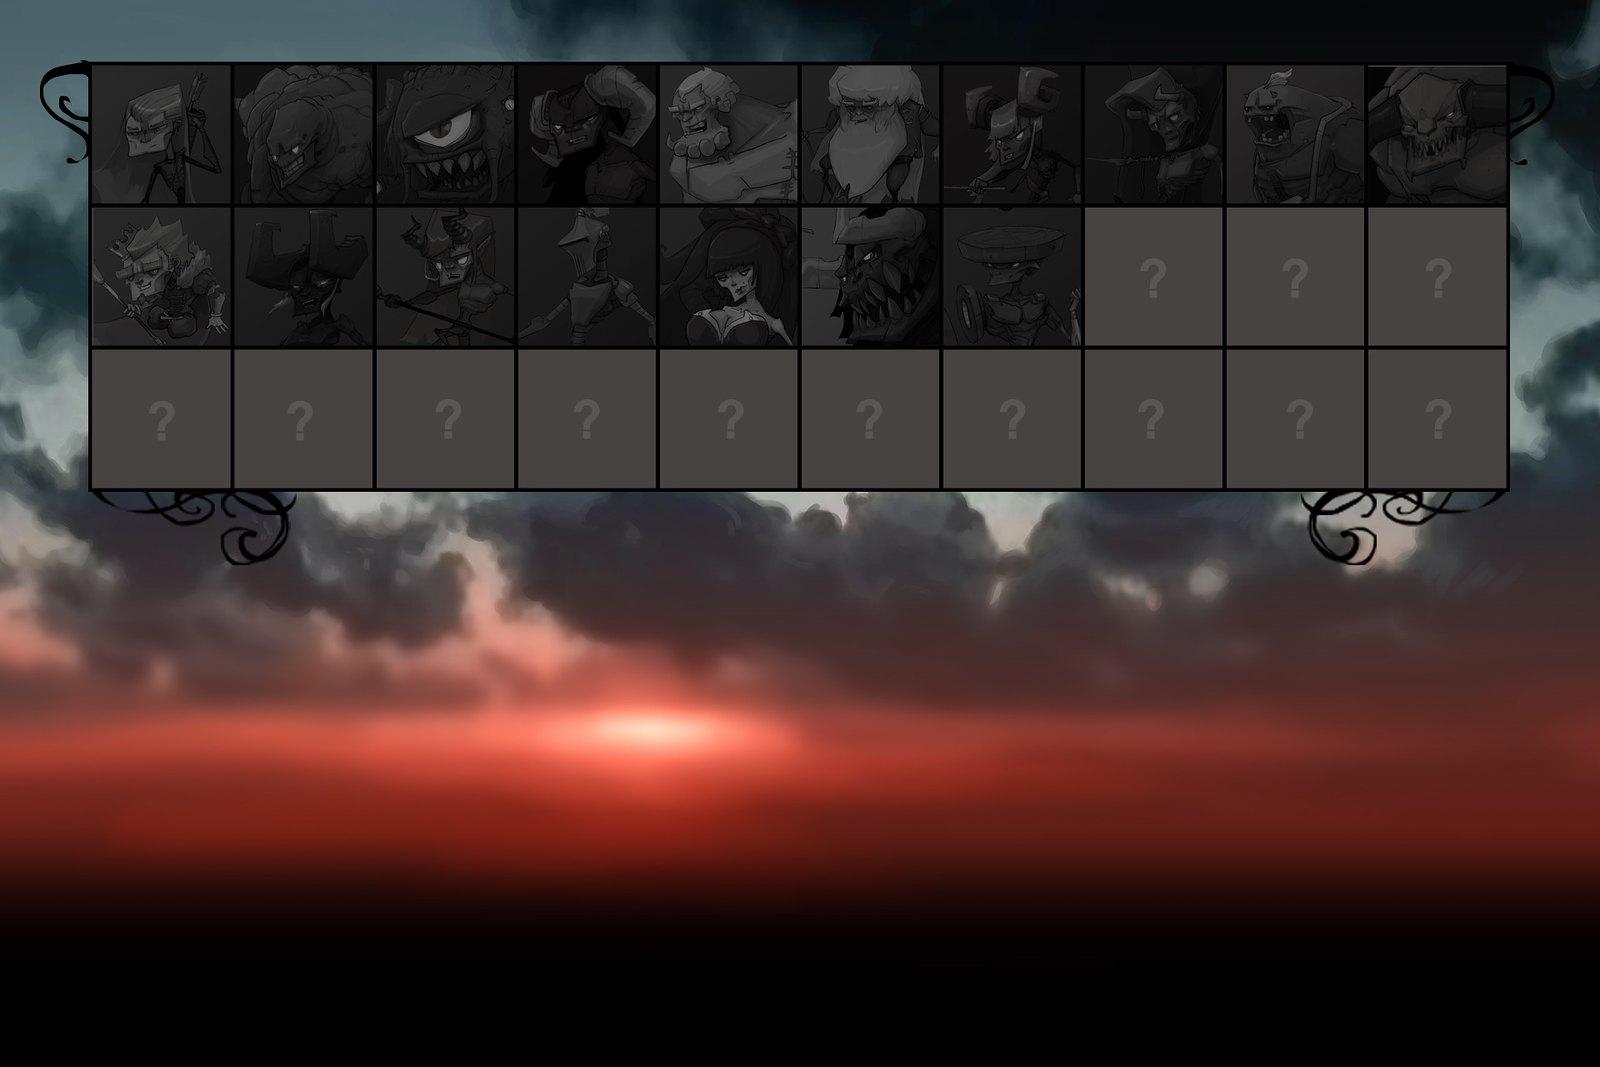 50295346157 8e8144ed5b h - Der Anfang von Bounty Battle